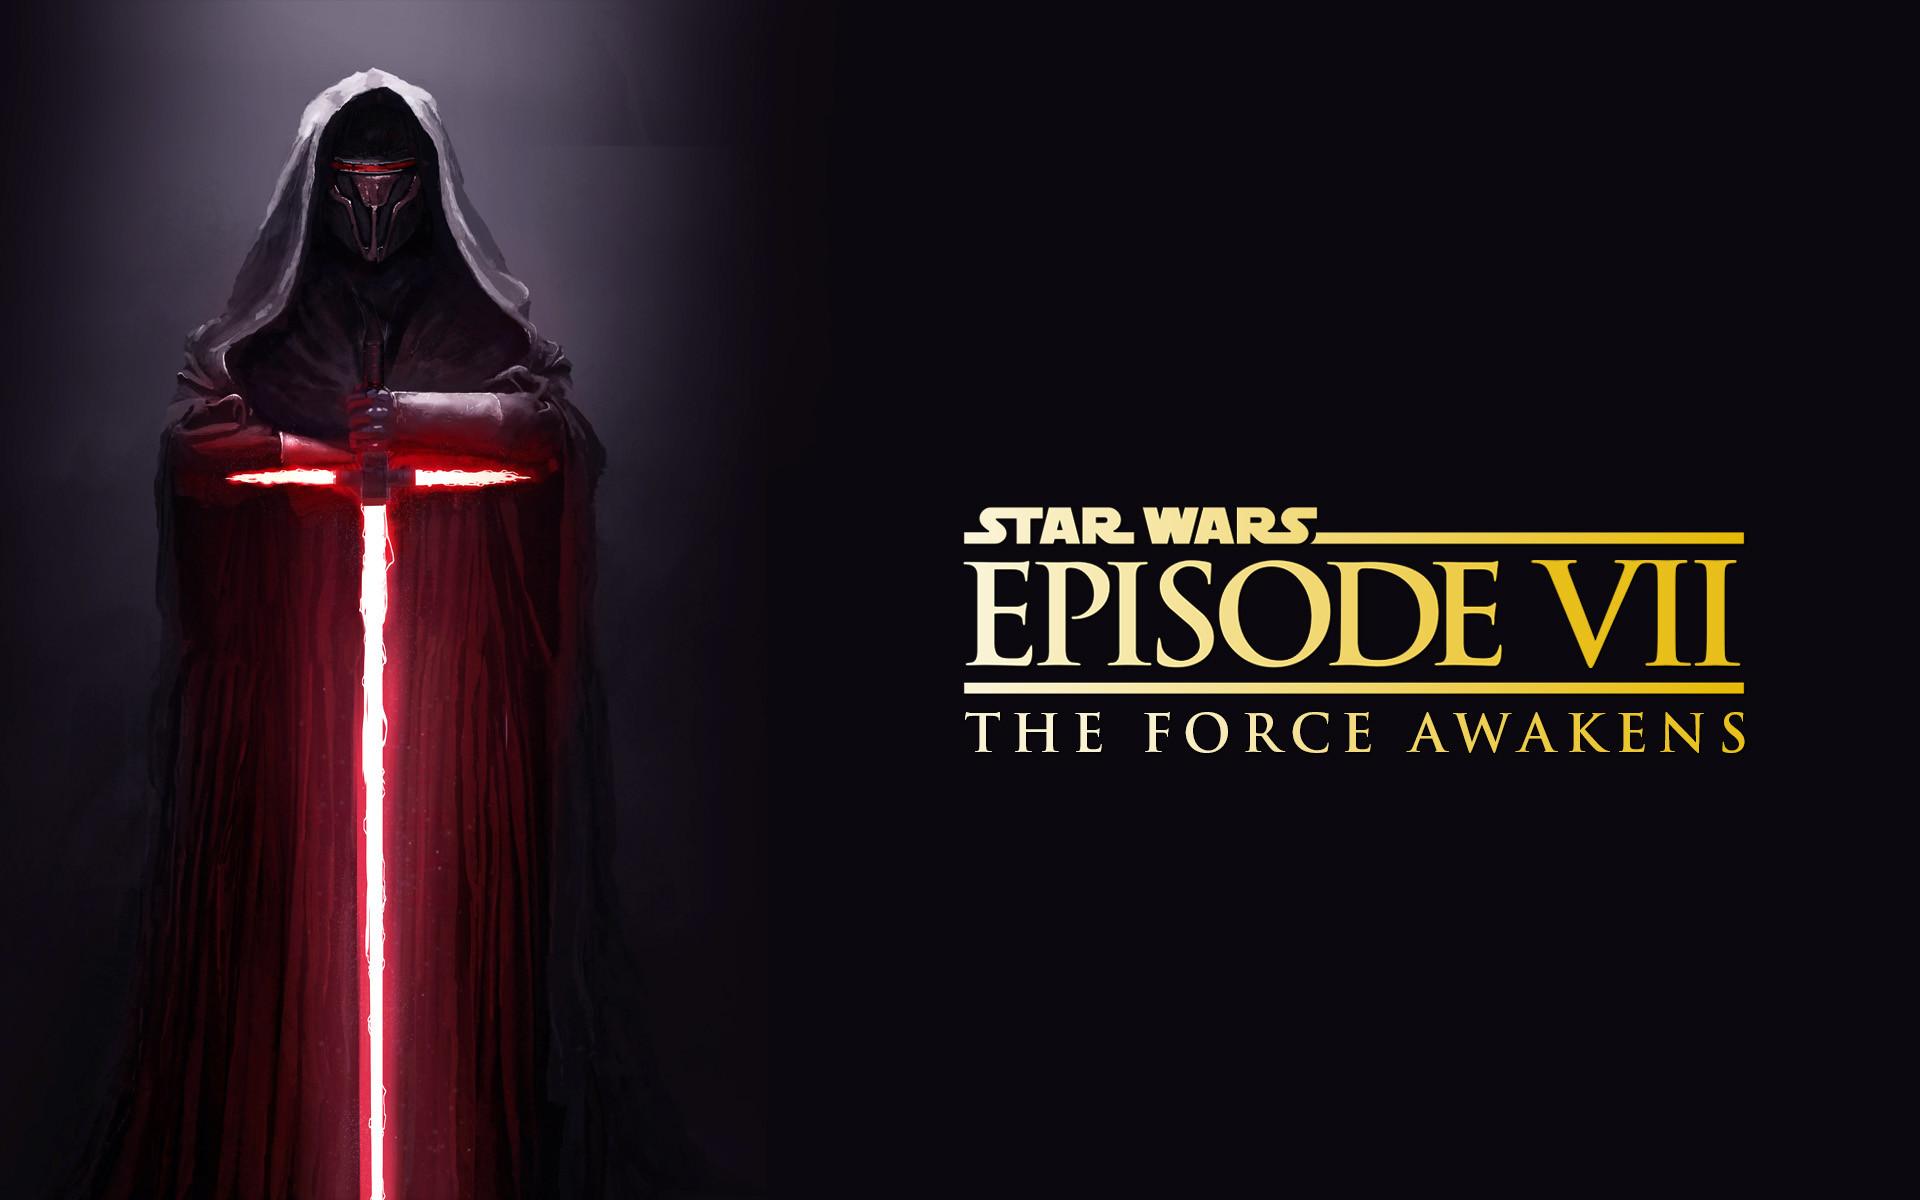 … kylo_ren_star_wars_the_force_awakens Kylo-Ken-wallpaper Kylo-Ren  STAR_WARS_FORCE_AWAKENS star_wars_the_force_awakens_kylo_ren …